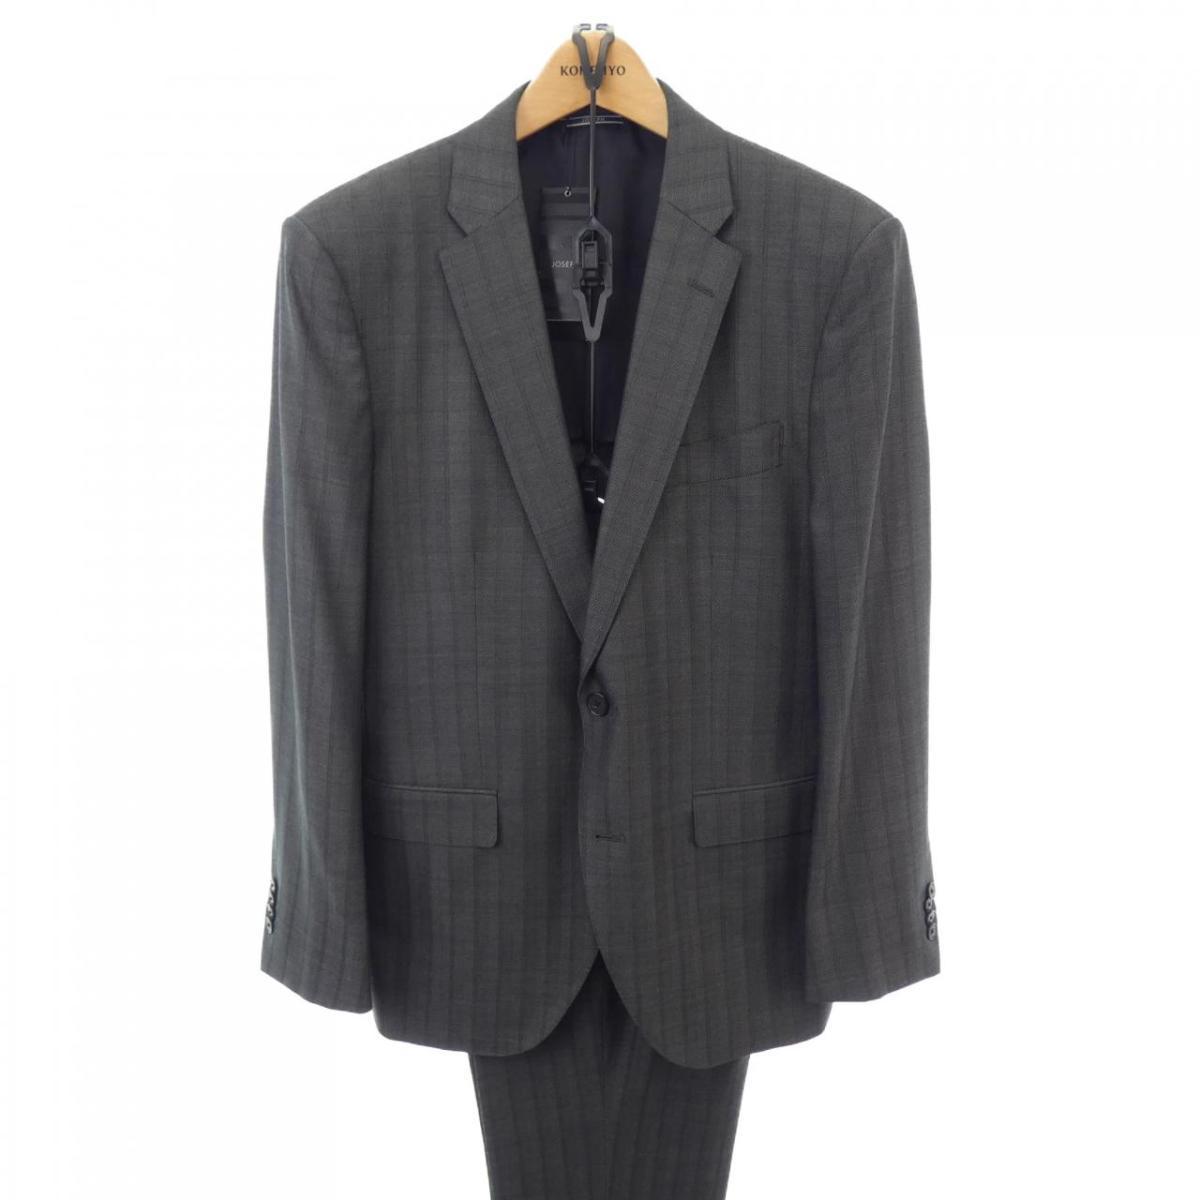 WEB限定 ジョセフオム JOSEPH HOMME 中古 ブランド品 スーツ